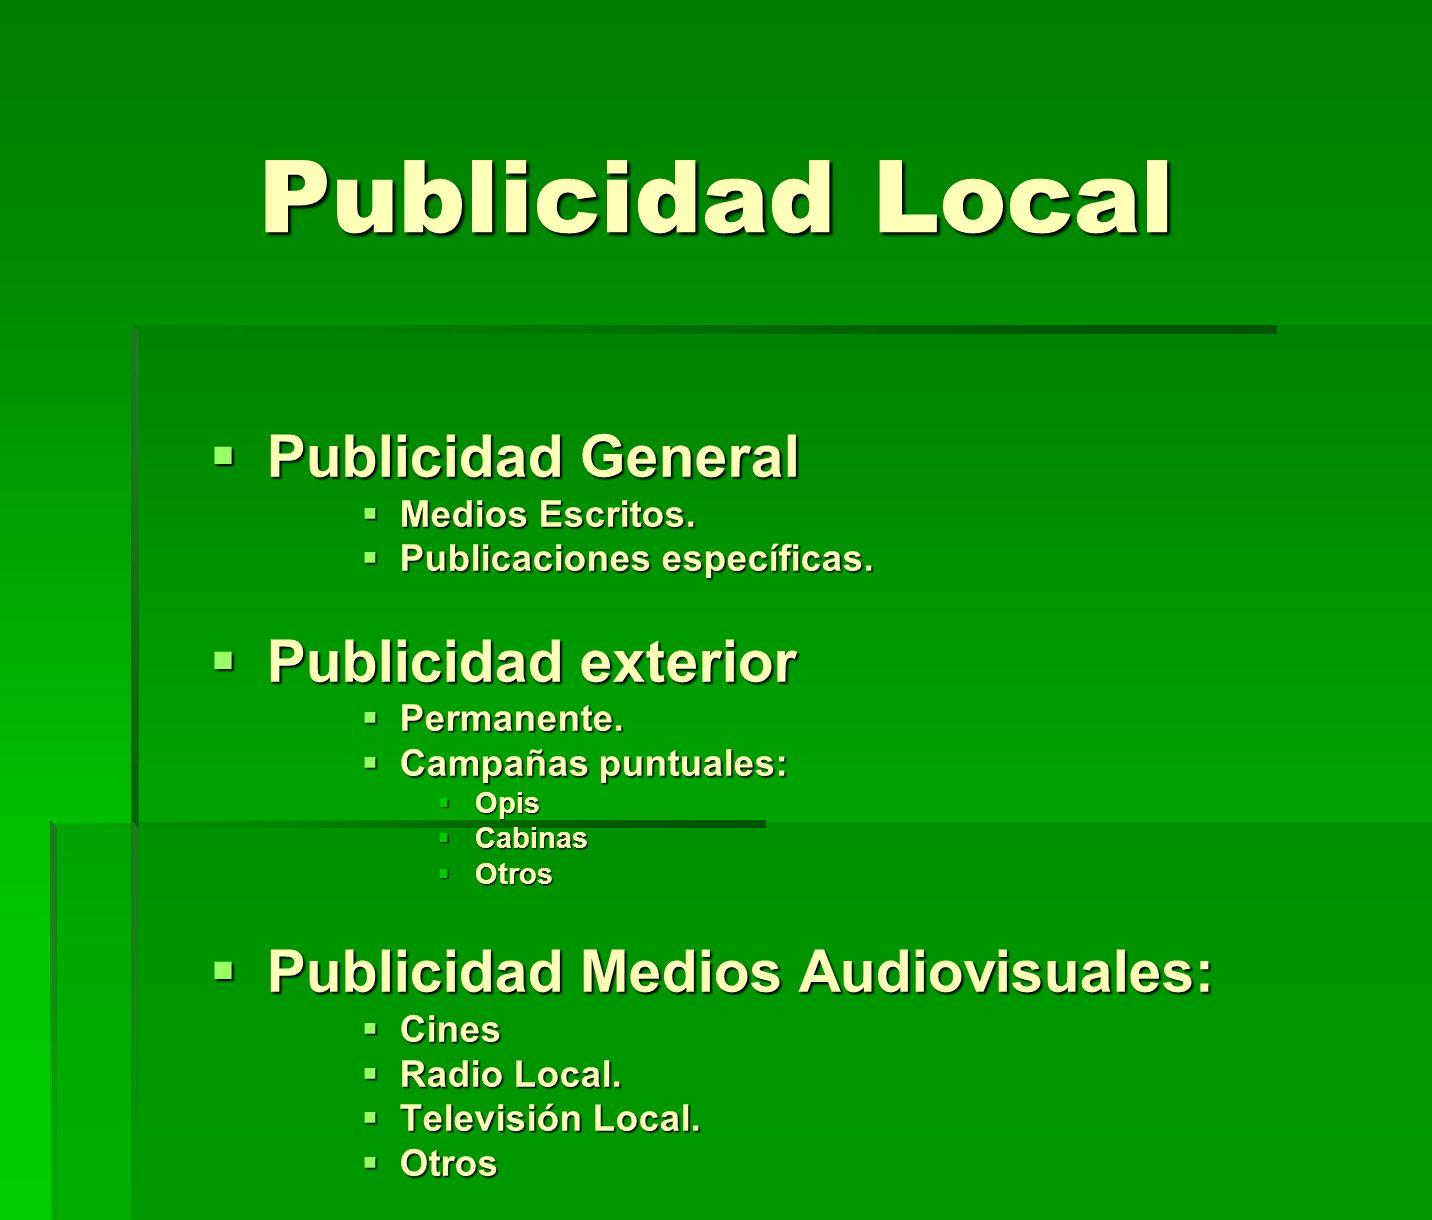 Publicidad Local Publicidad General Publicidad exterior